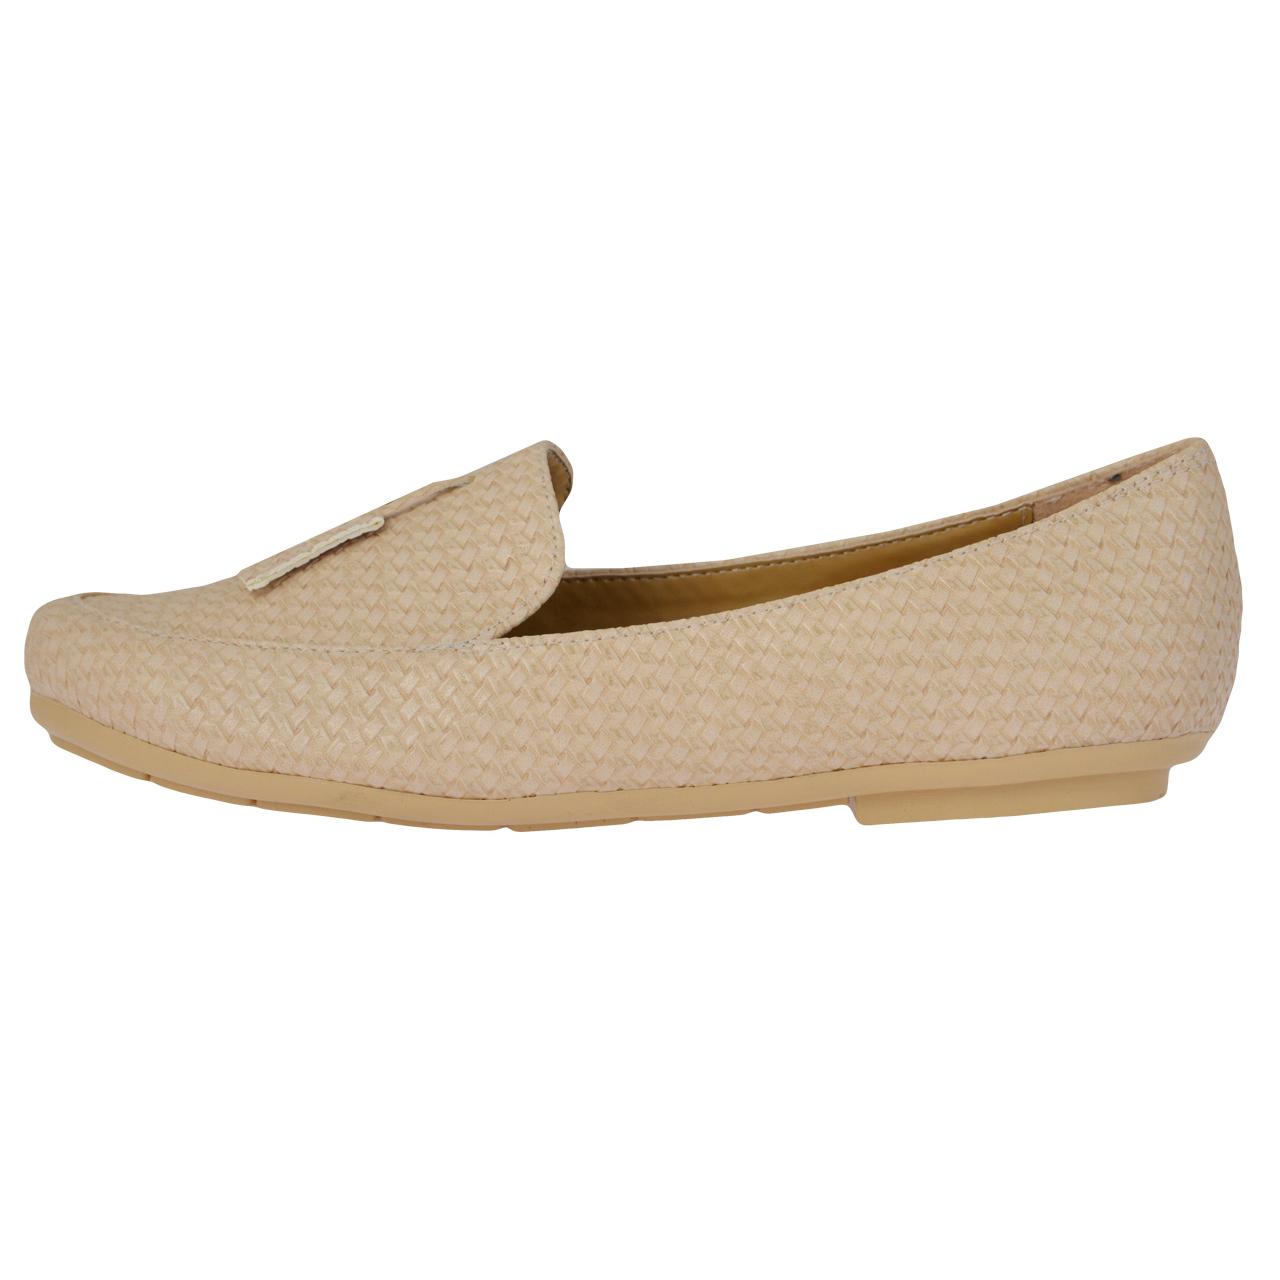 تصویر کفش زنانه کد 159013209